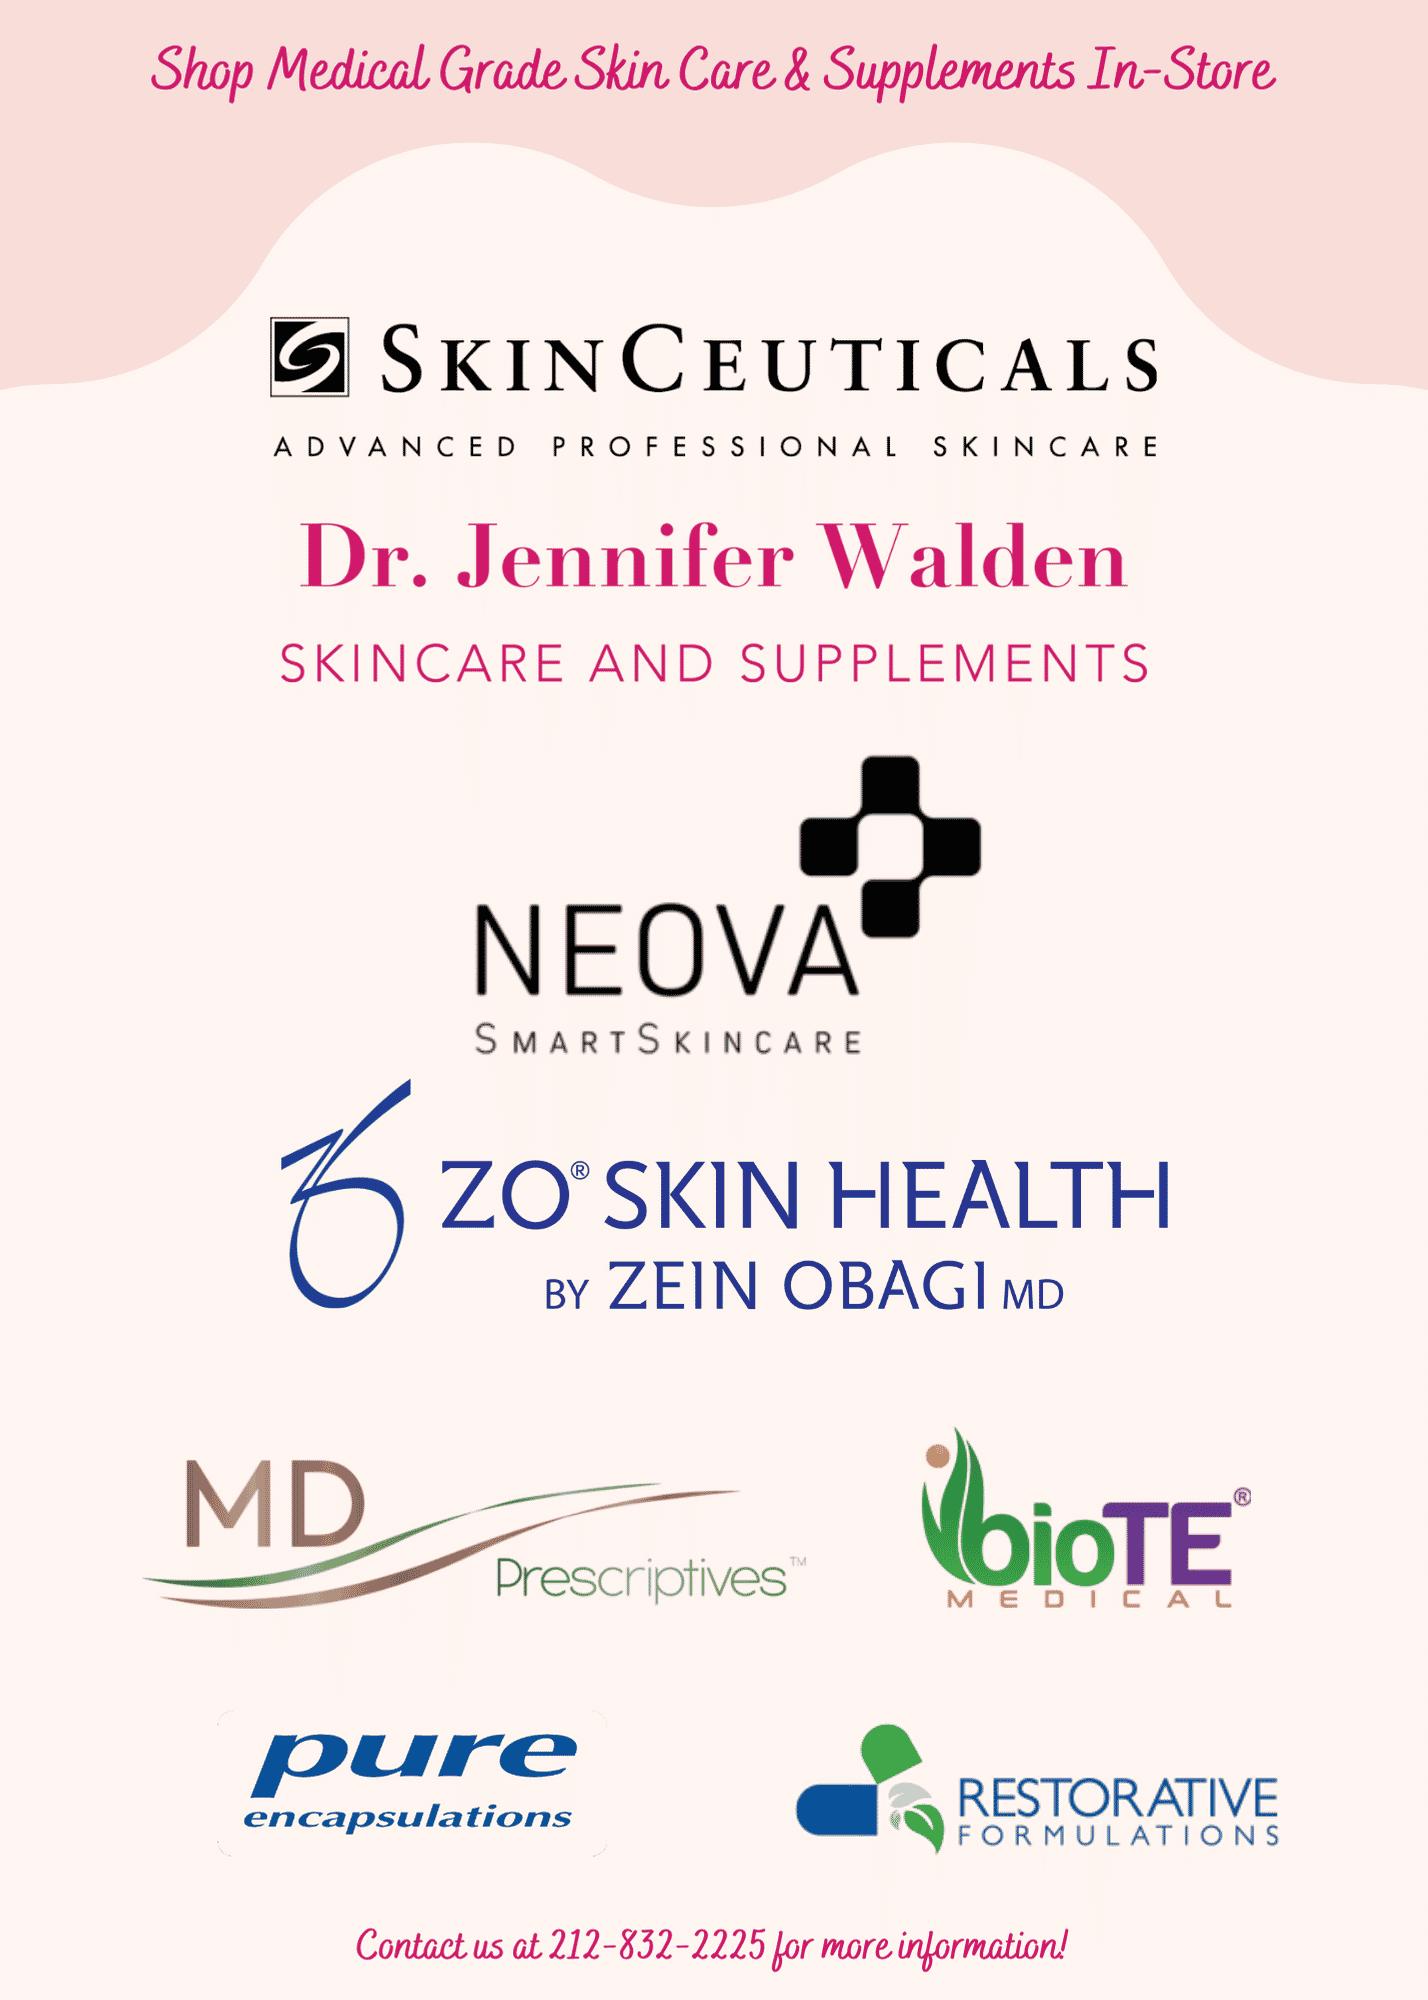 shop medical grade skin care in store1